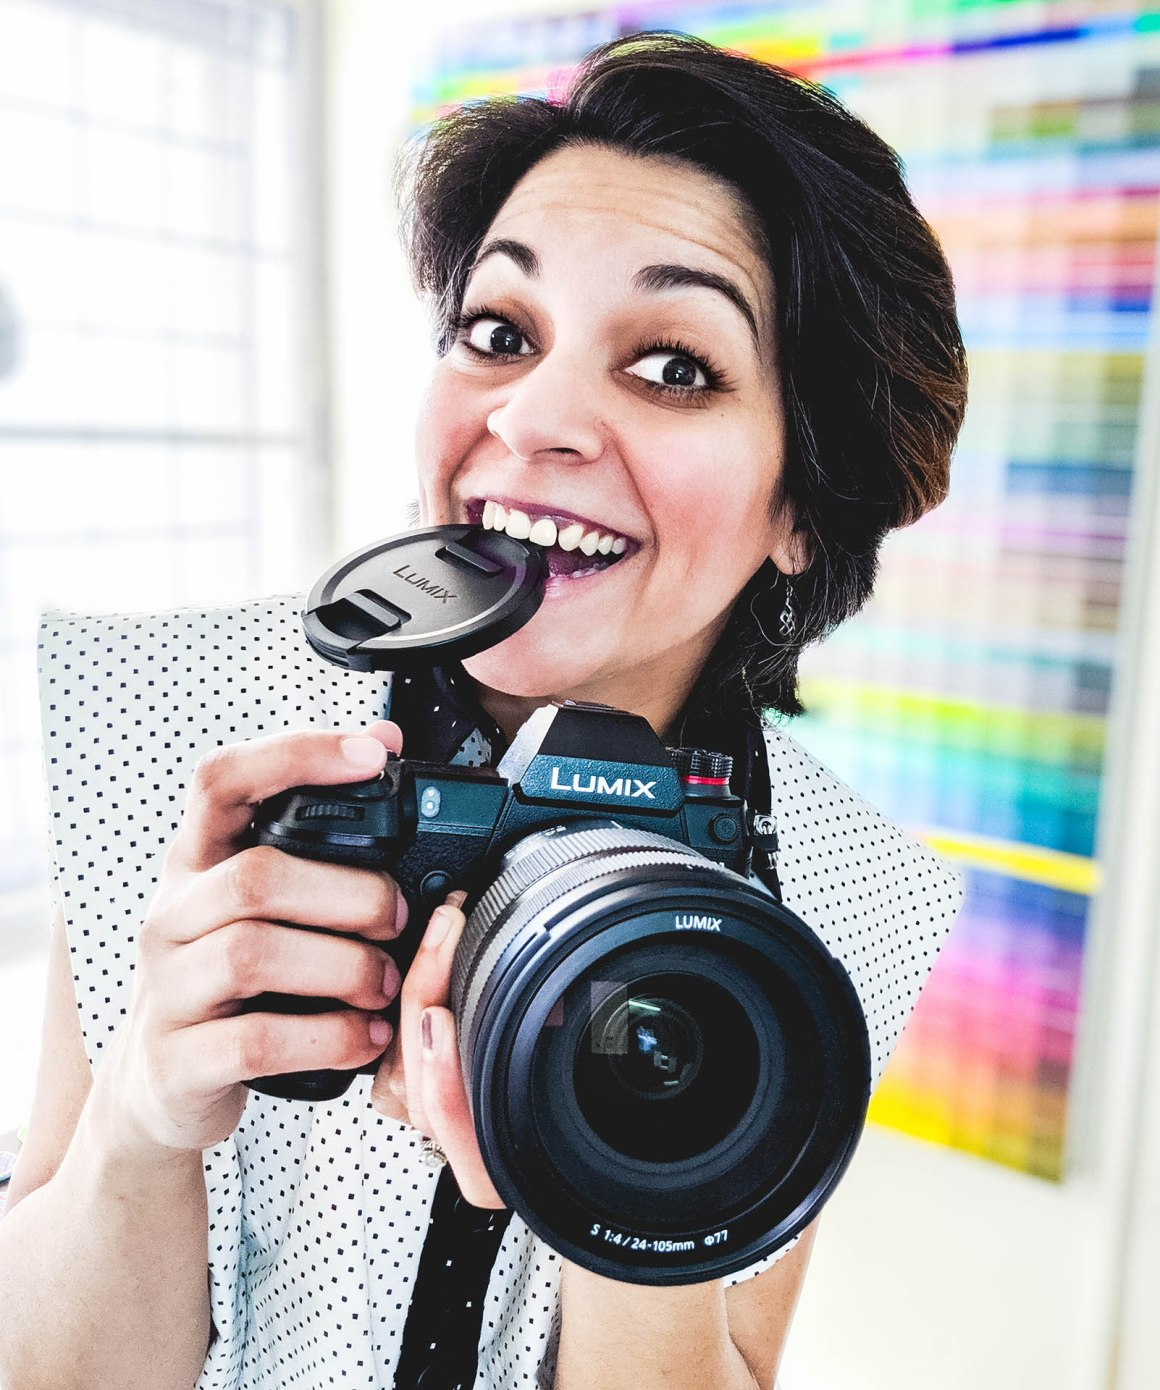 lumix s1, lumixs, lumixs1, nainaxlumix, panasonic lumix, camera review, full frame mirrorless, mirrorless camera, naina redhu, naina.co, eyesfortechnology, lumix camera, panasonic flagship, flagship camera, high end professional camera, gangtok, professional photography